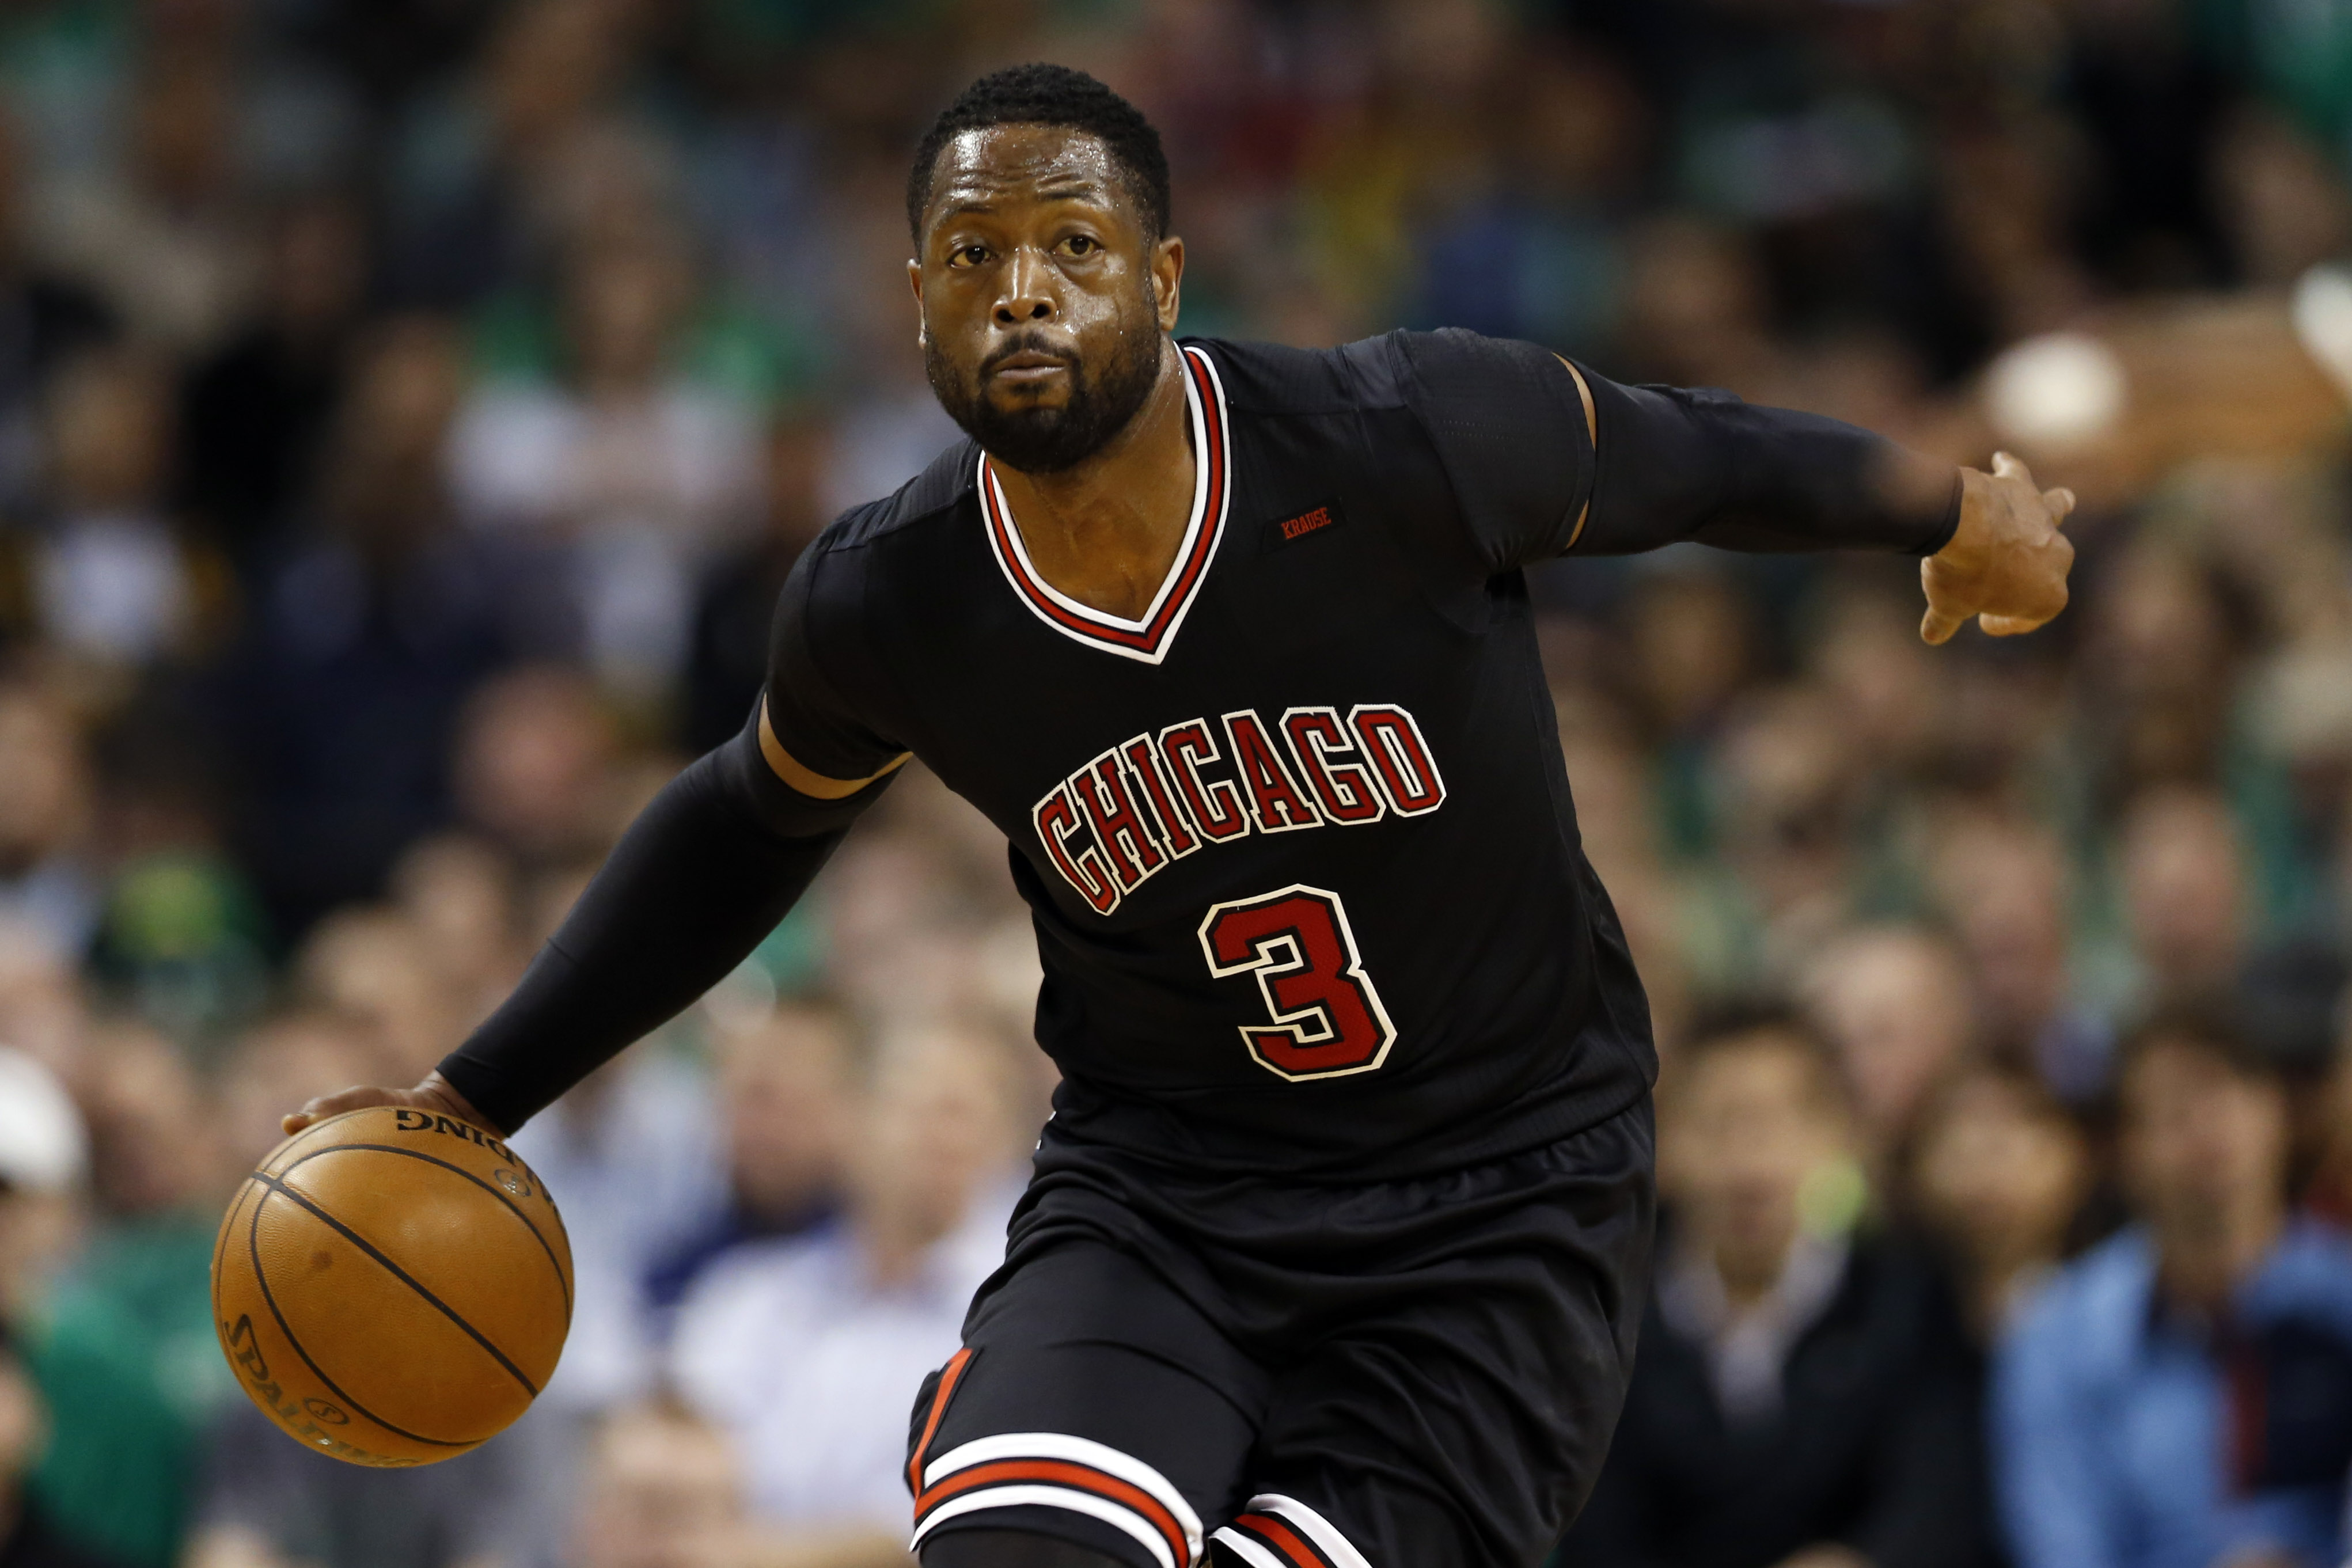 Chicago Bulls player reviews for 2016-17 season: Dwyane Wade